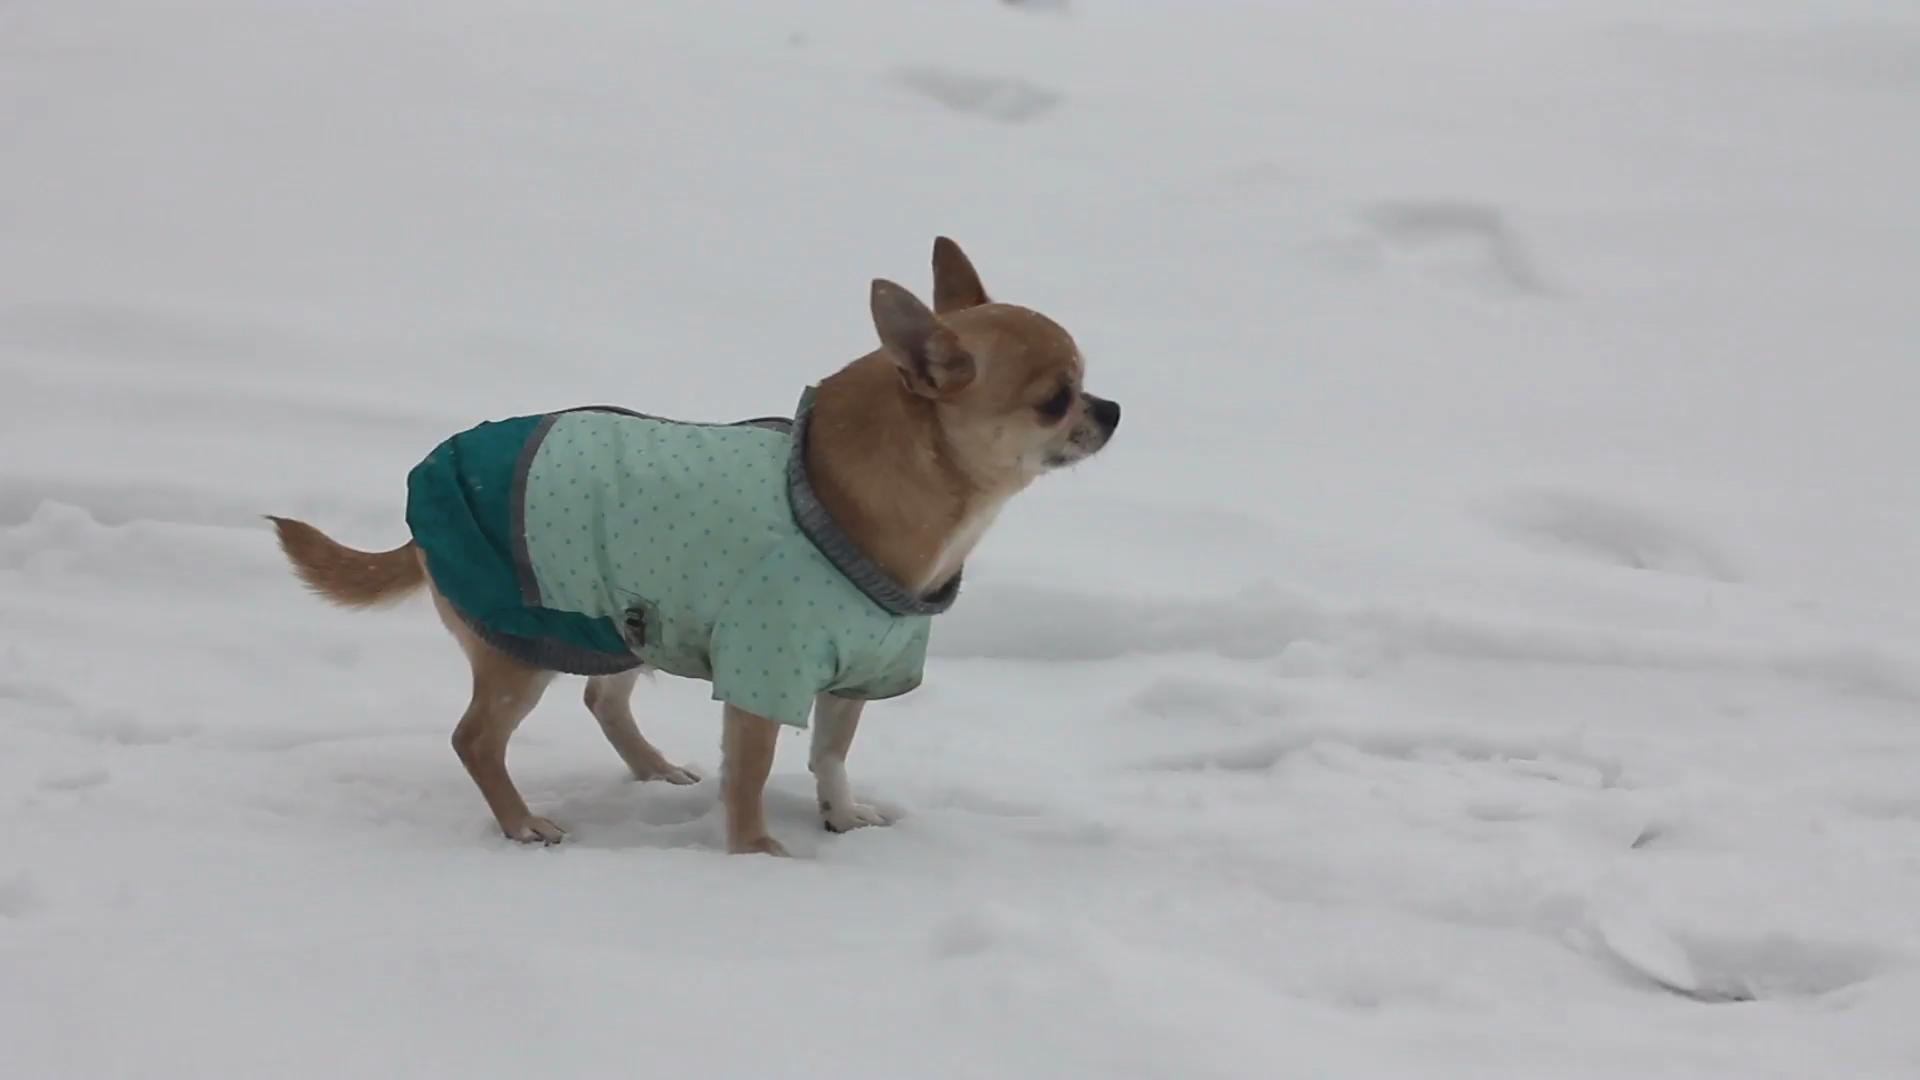 Braucht chihuahua mantel